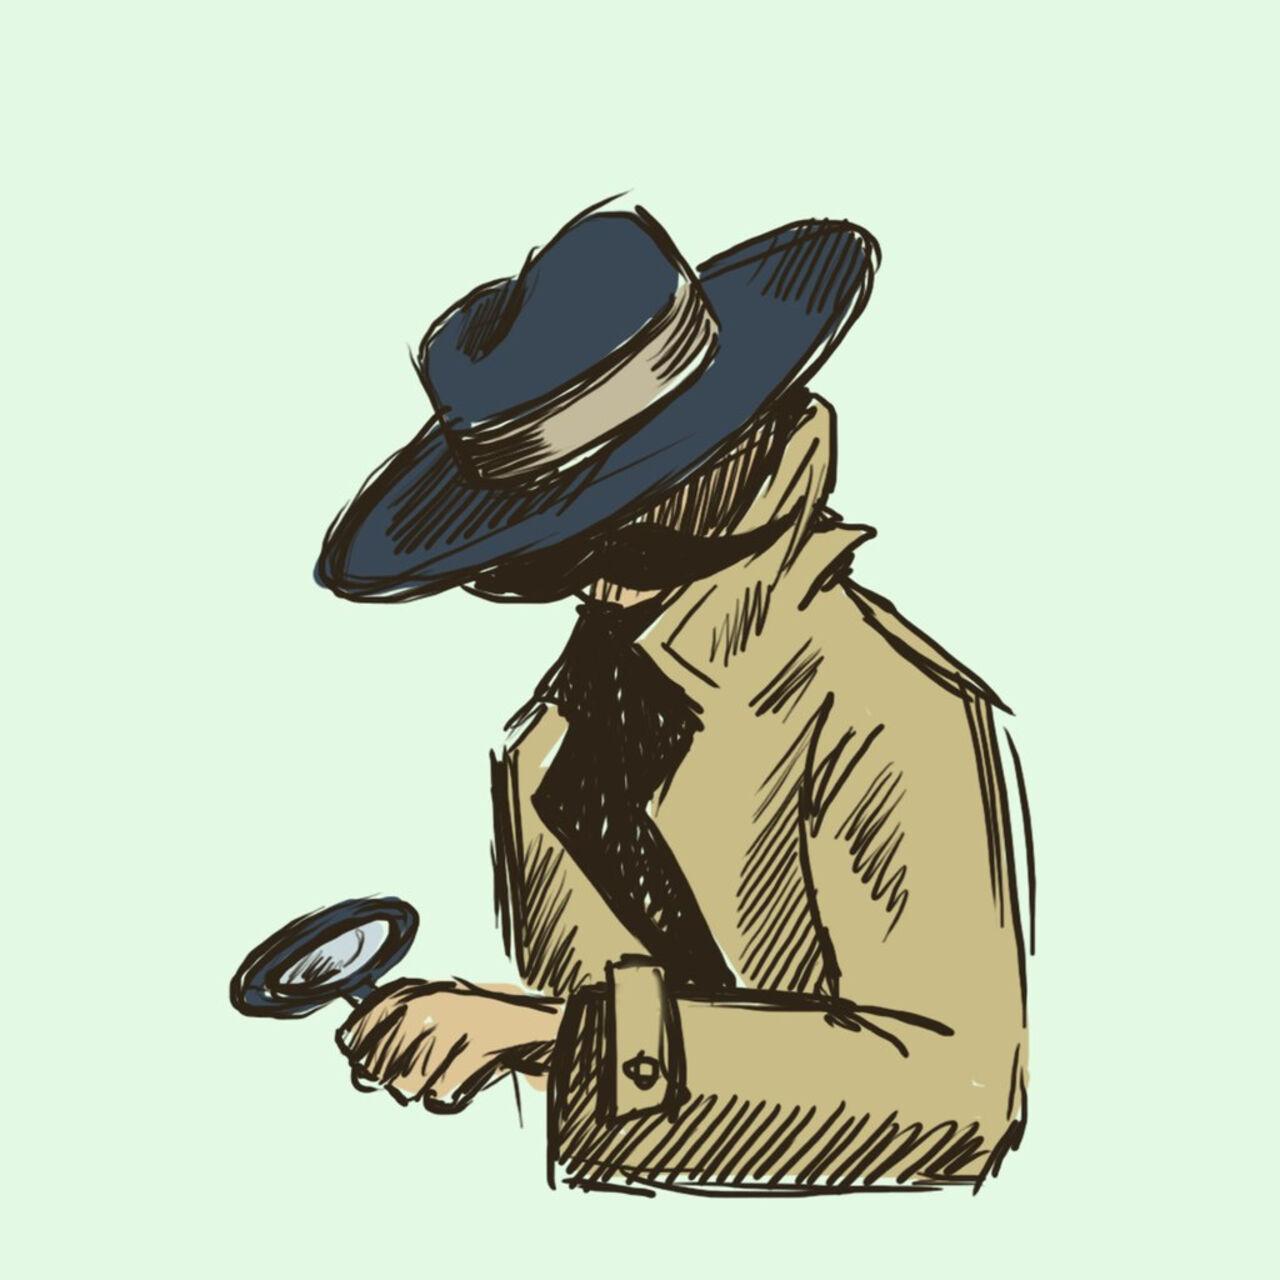 лесбияночкам услуги частного детектива в барнауле секс это намного